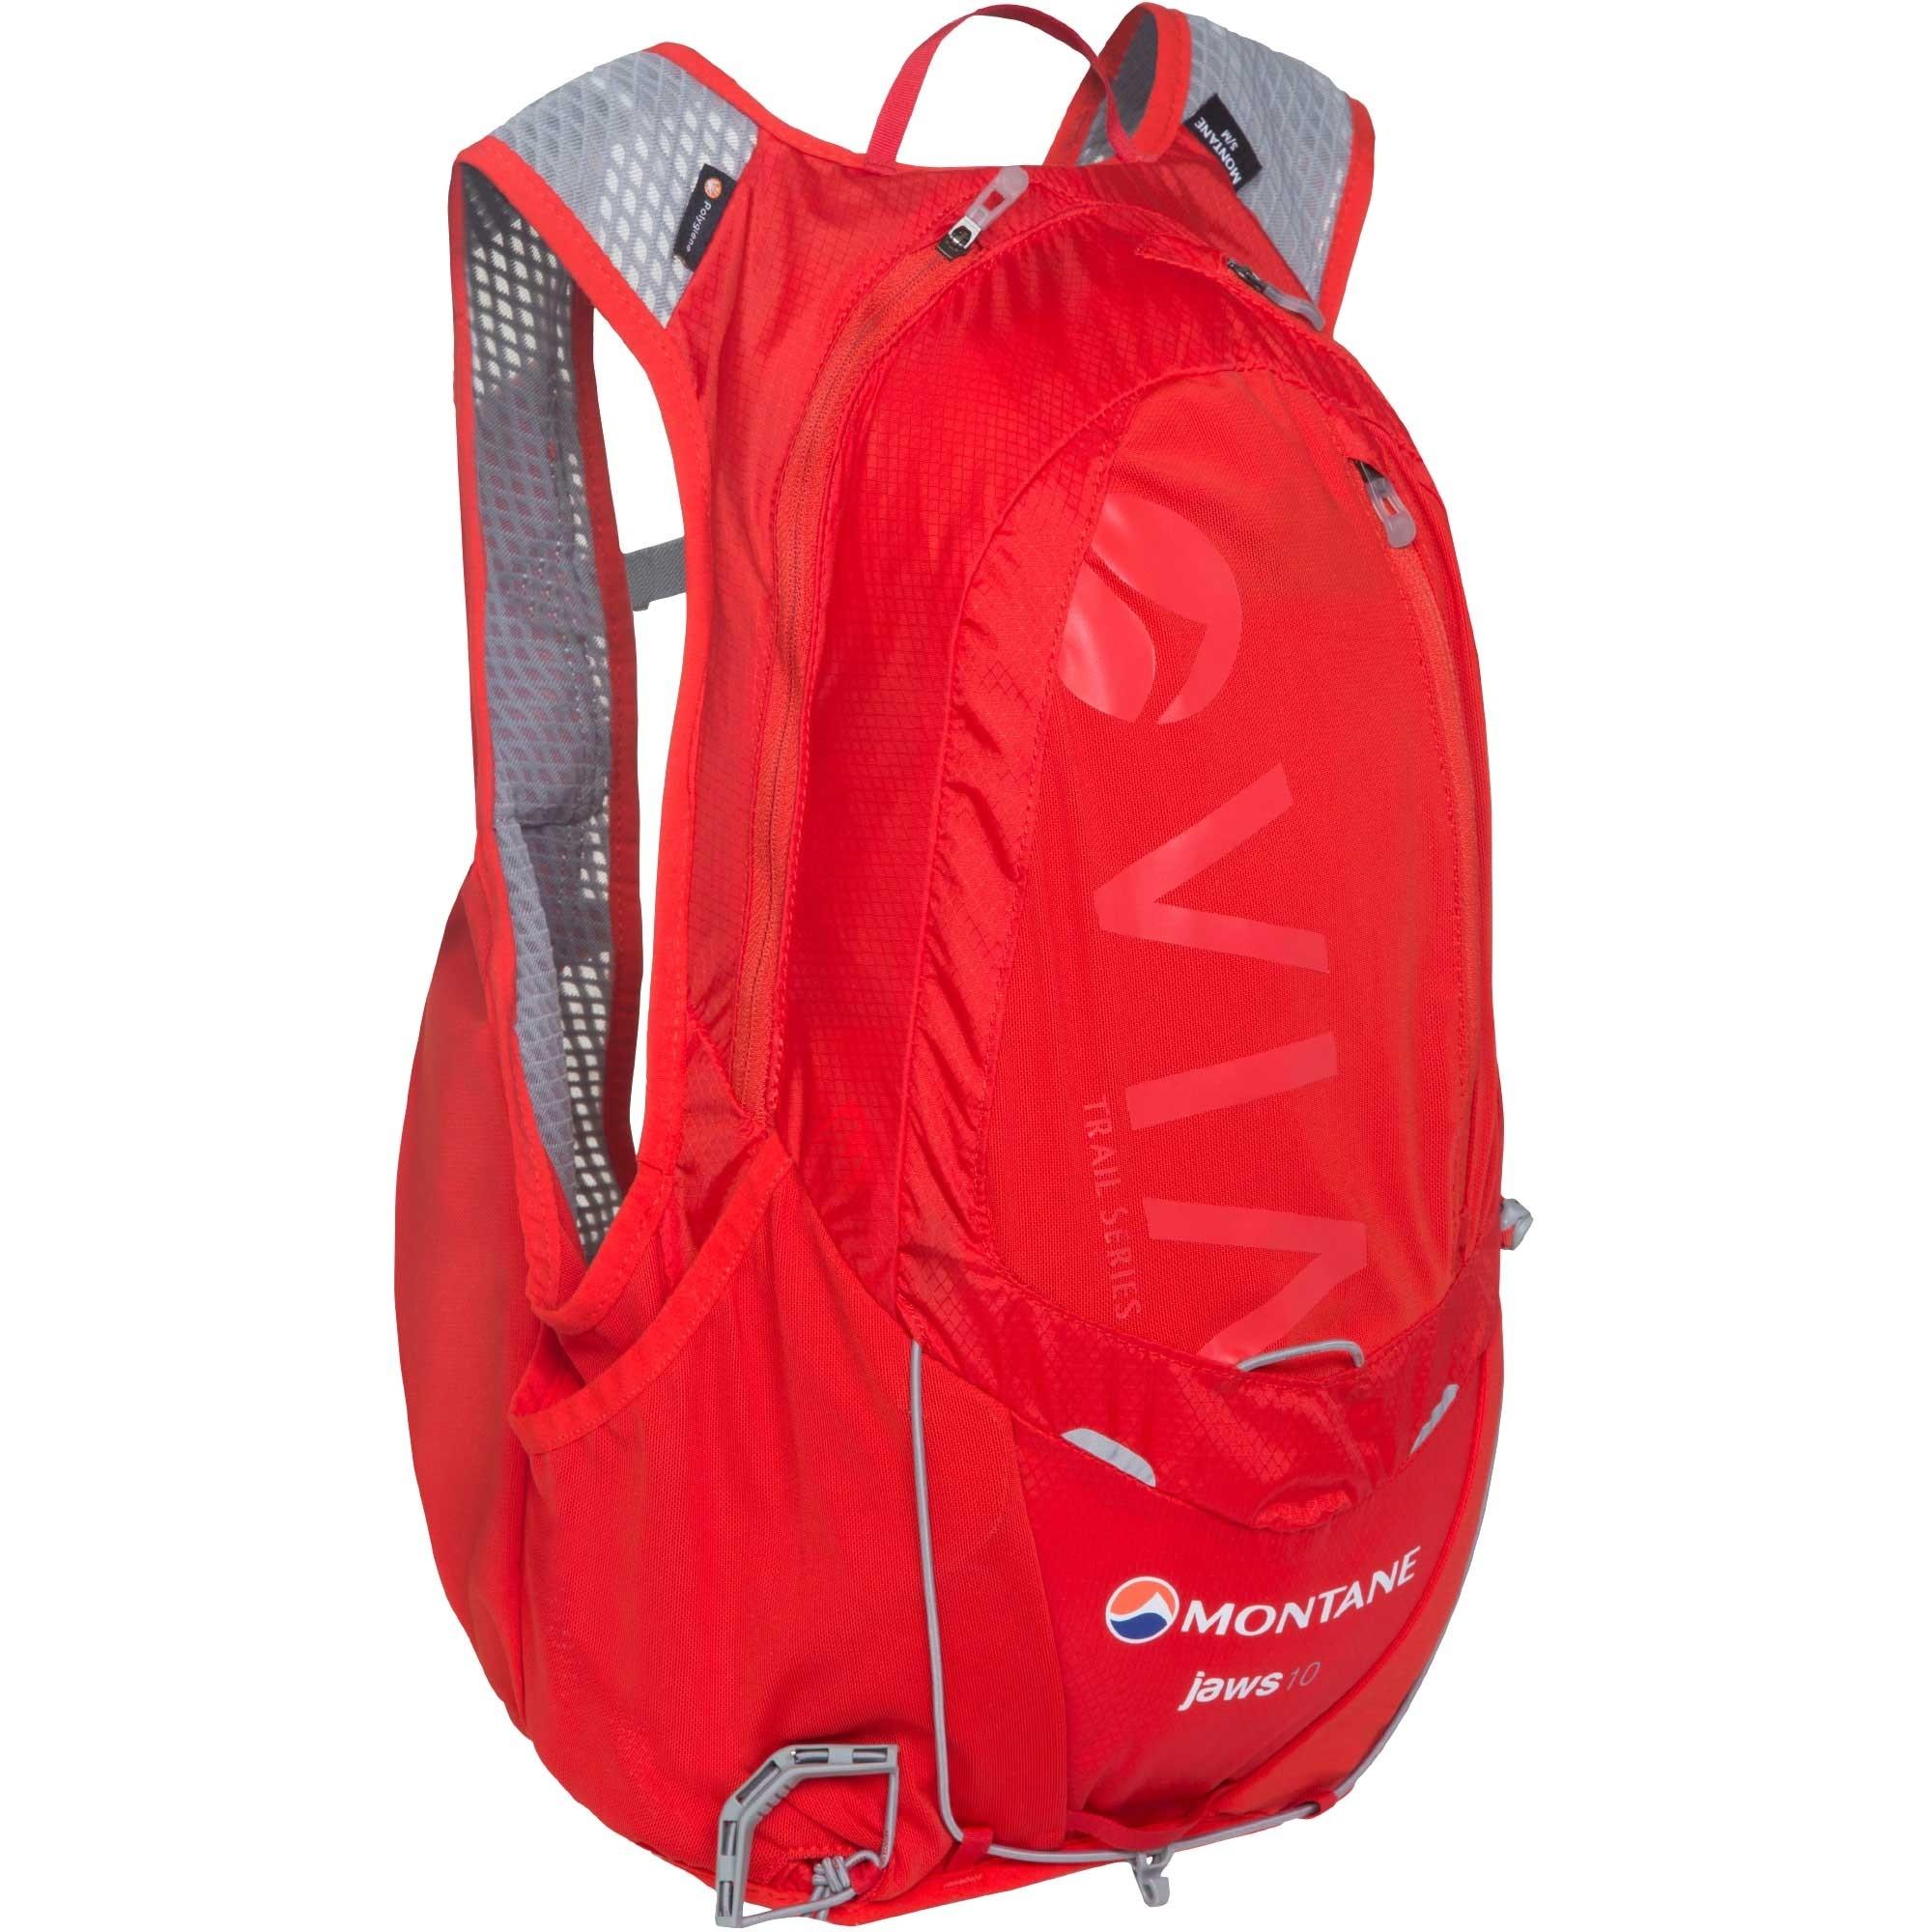 Montane VIA Jaws 10 Trail Running Speedpack - Side - Flag Red